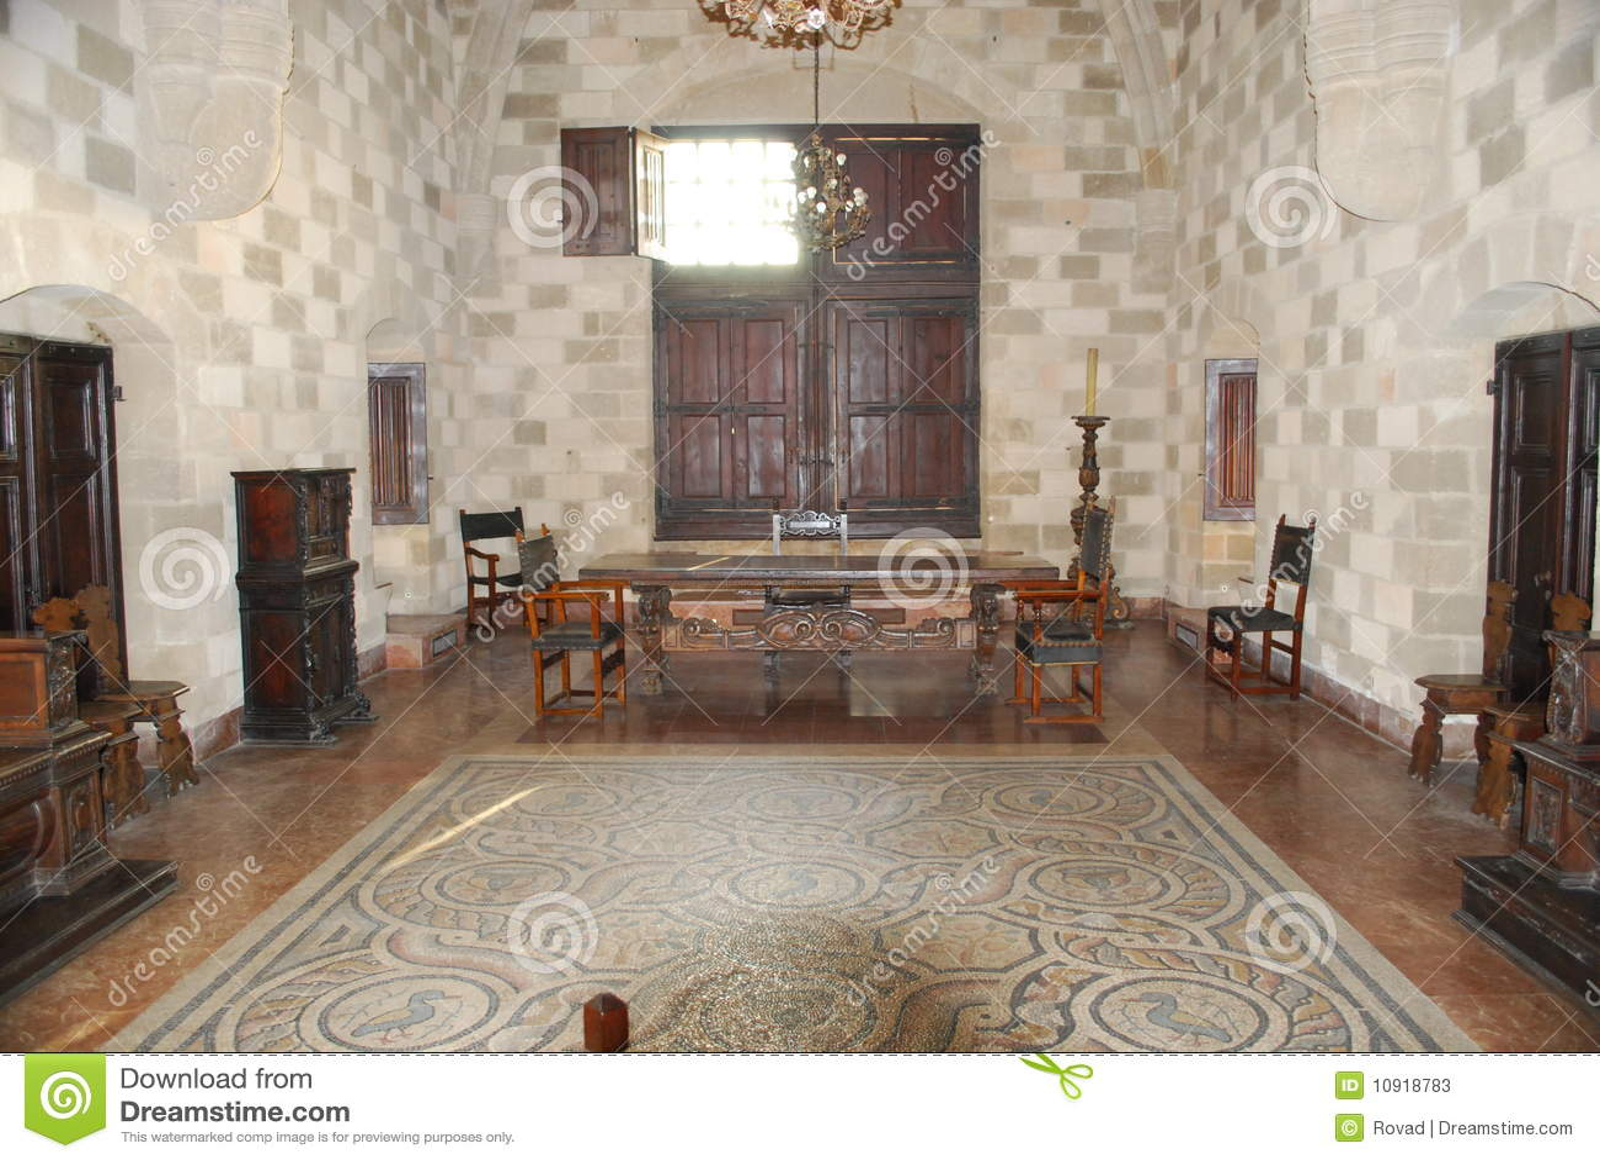 Medieval castle inside stock photos image 10918783 for Binnen interieur